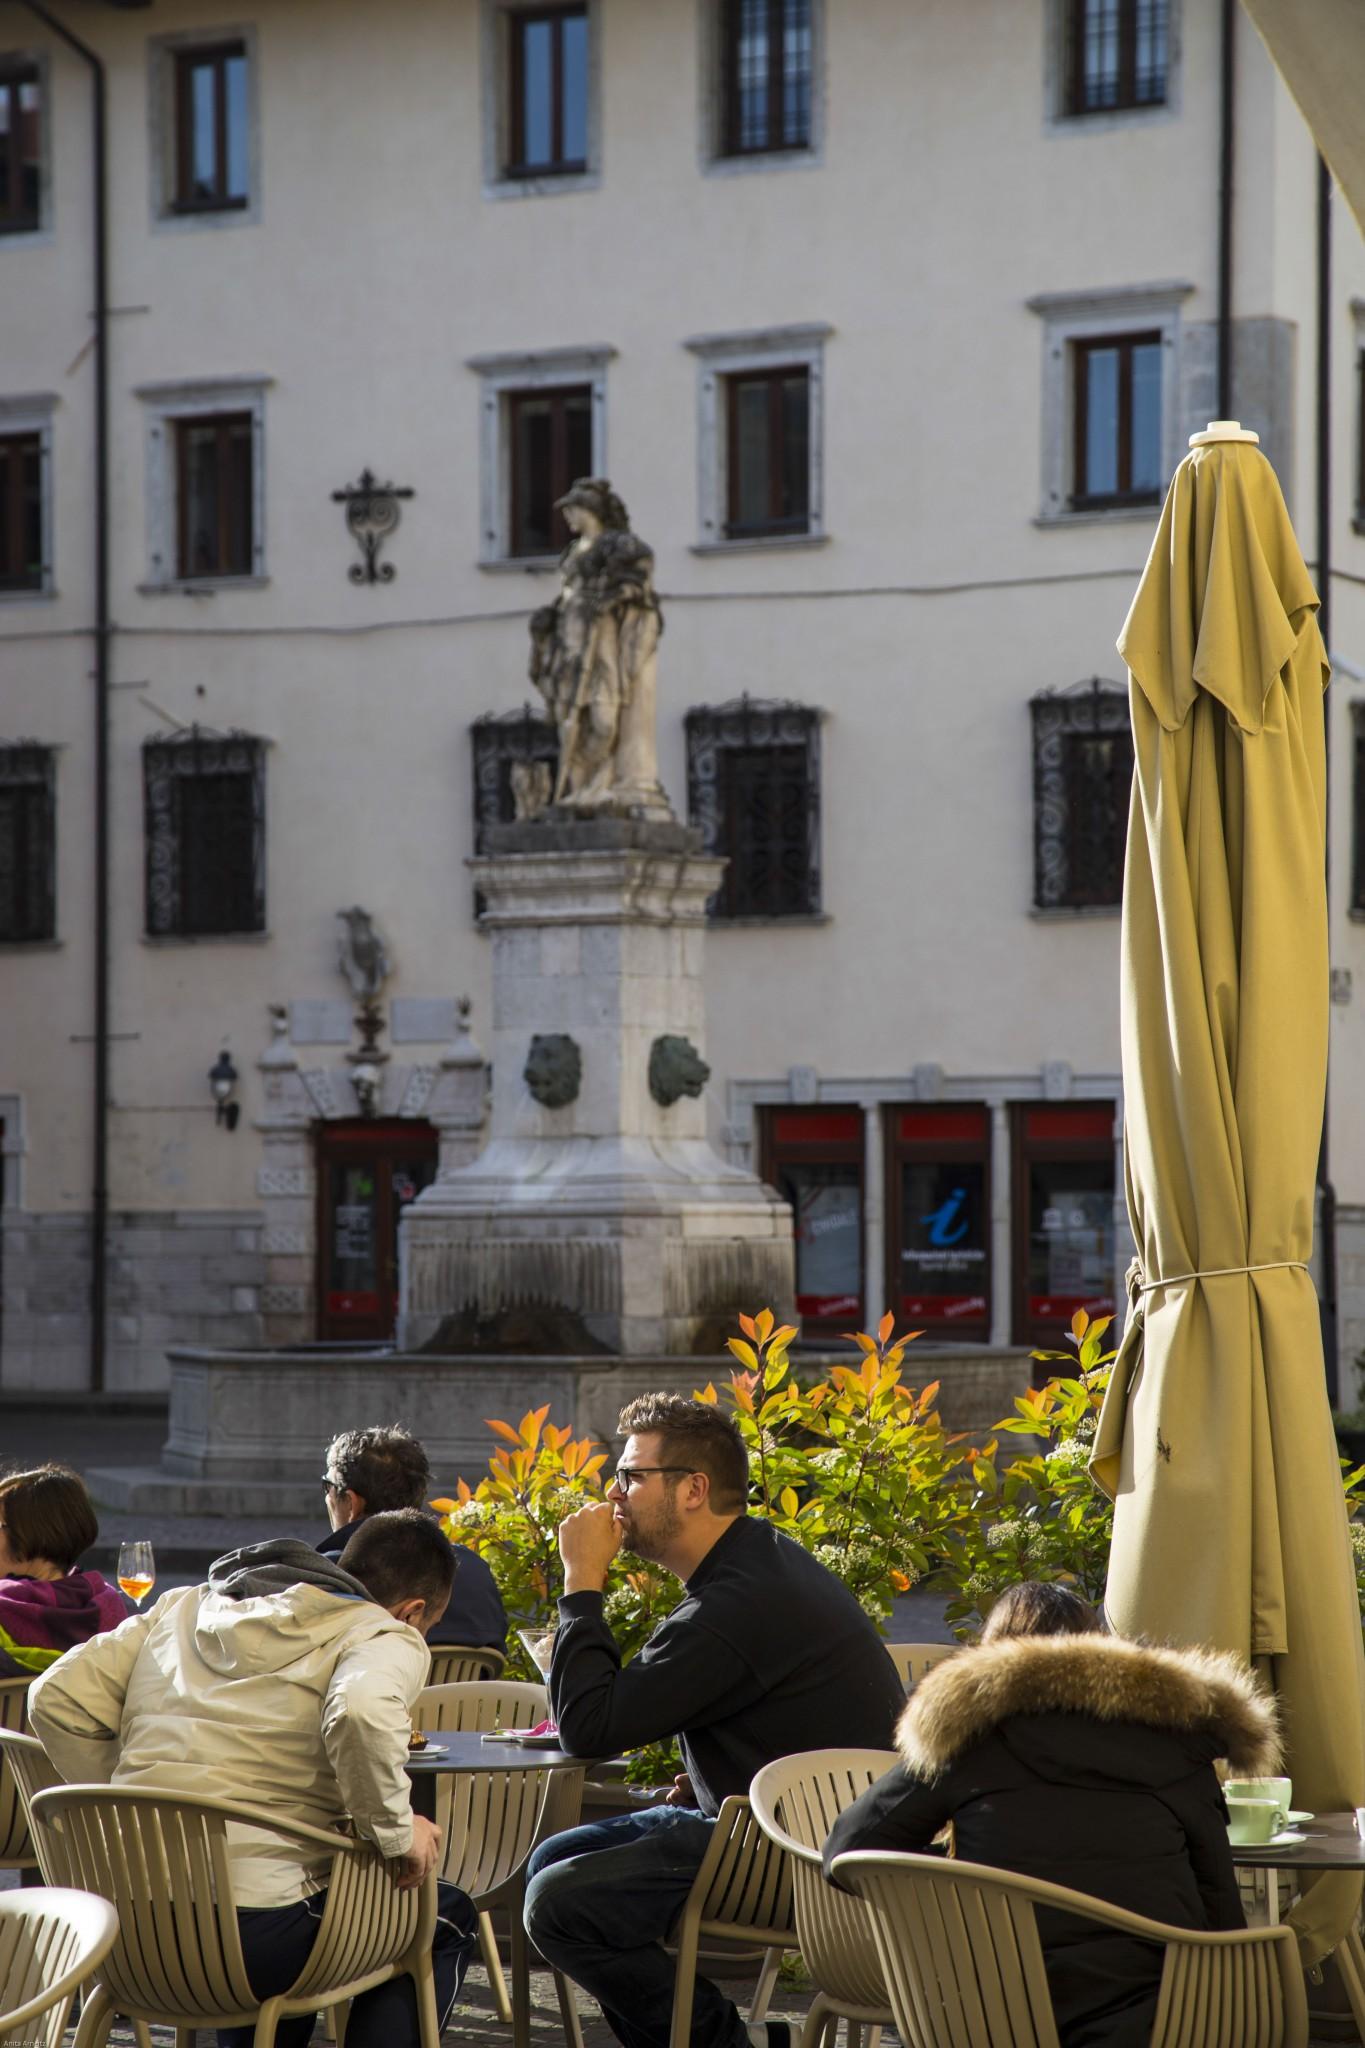 Cividale del Friuli, Foto Anita Arneitz